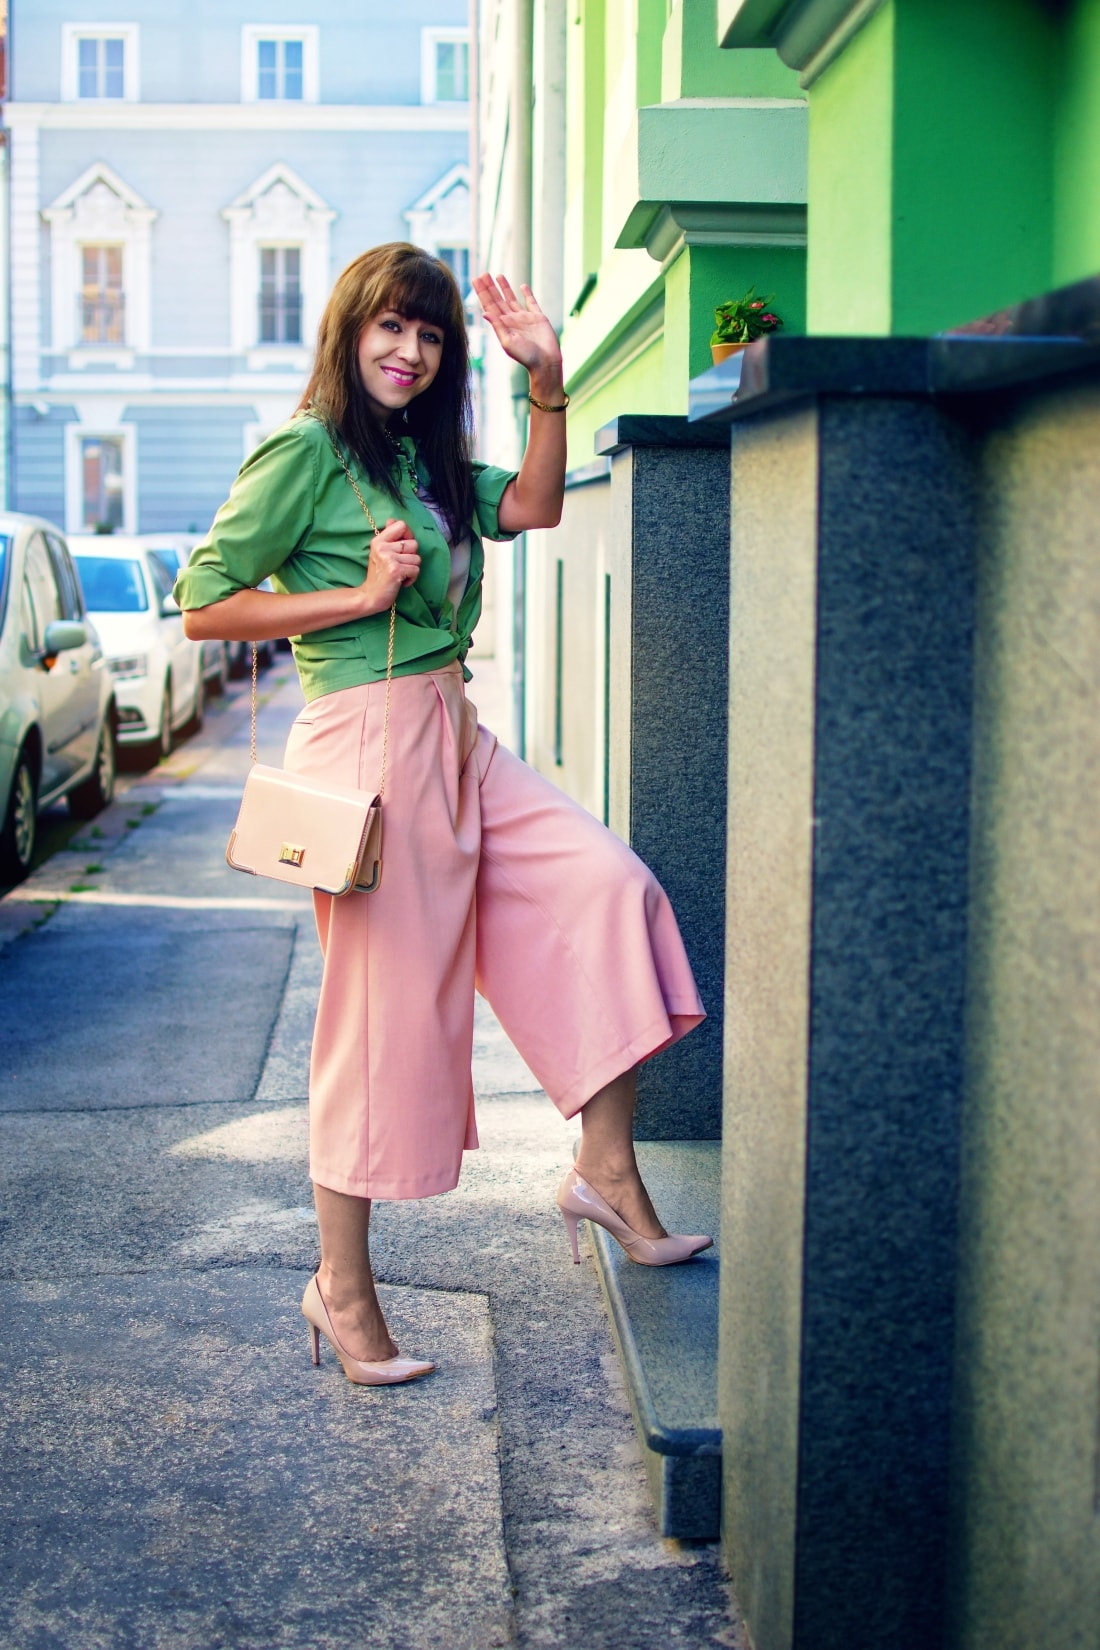 Culottes_Katharine-fashion is beautiful blog 1_Ružové nohavice_Nude lodičky_Katarína Jakubčová